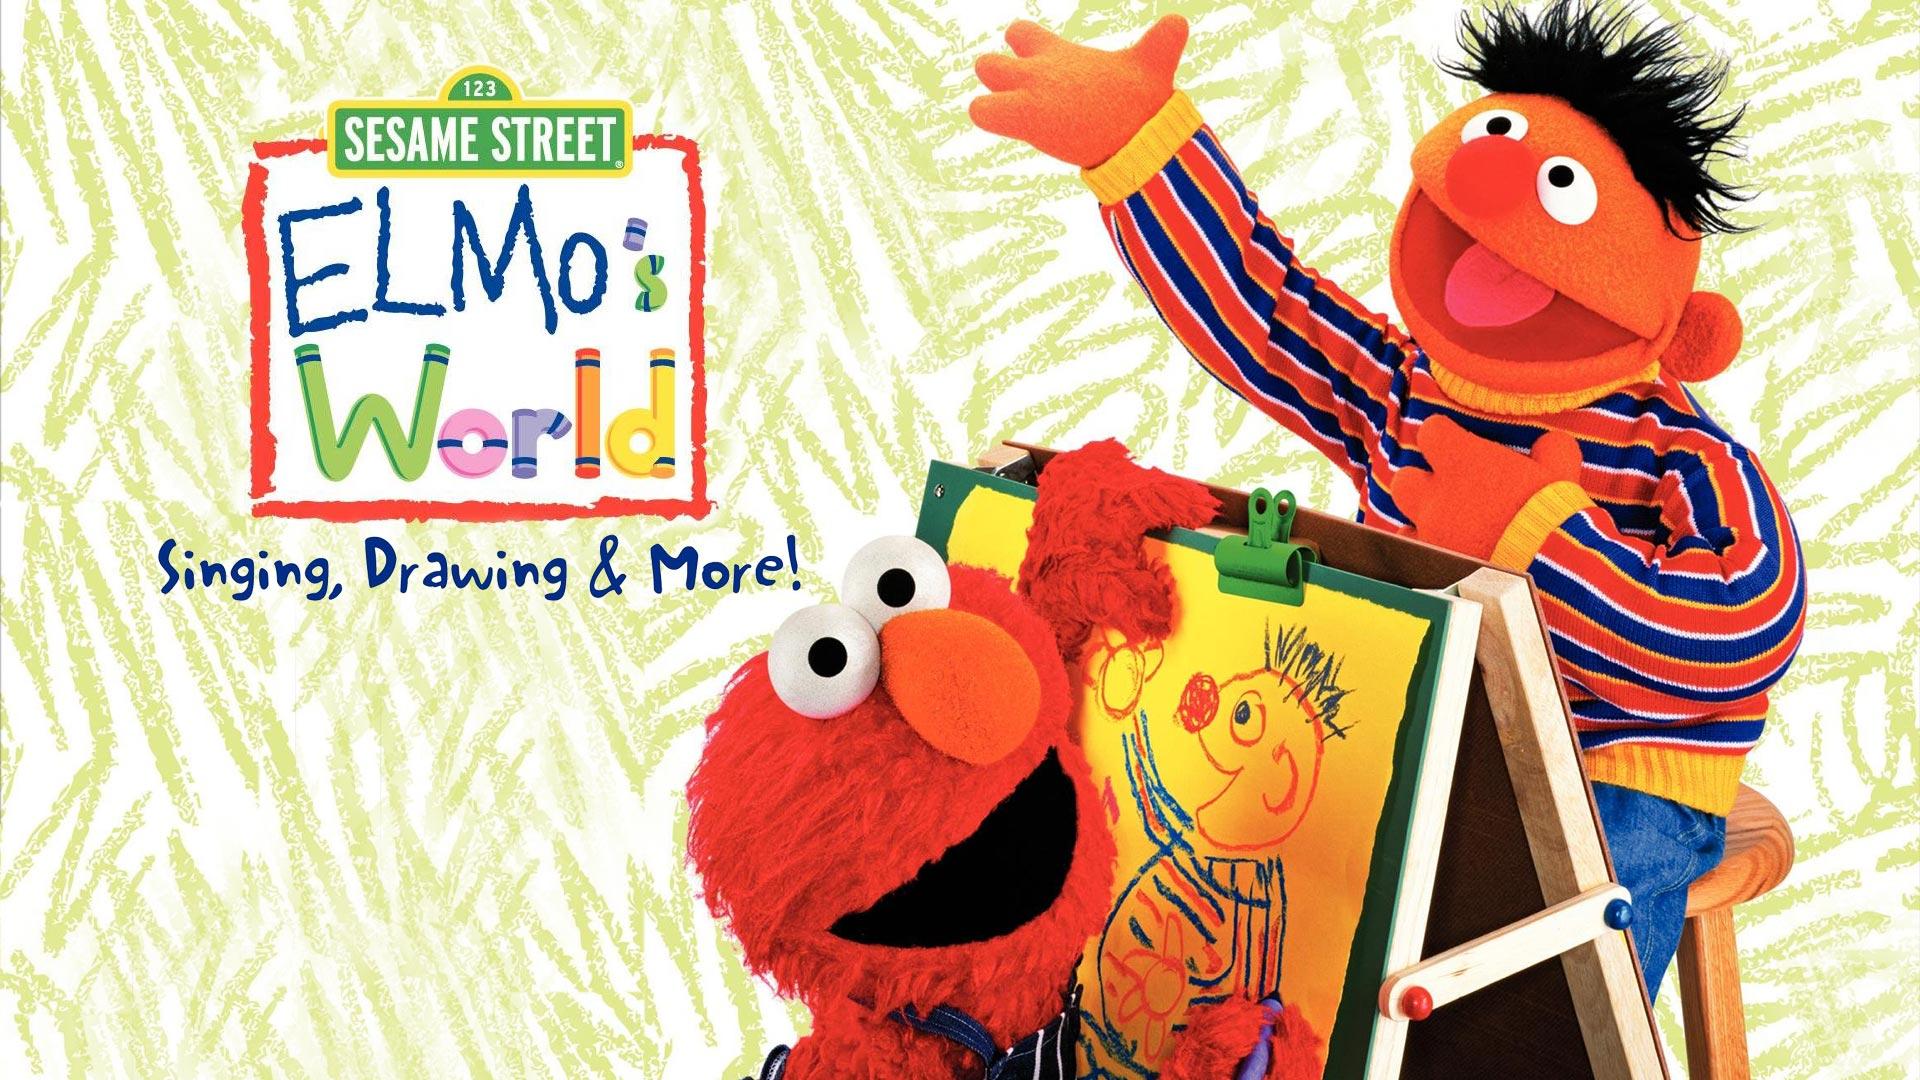 Elmo's World: Singing, Drawing, & More